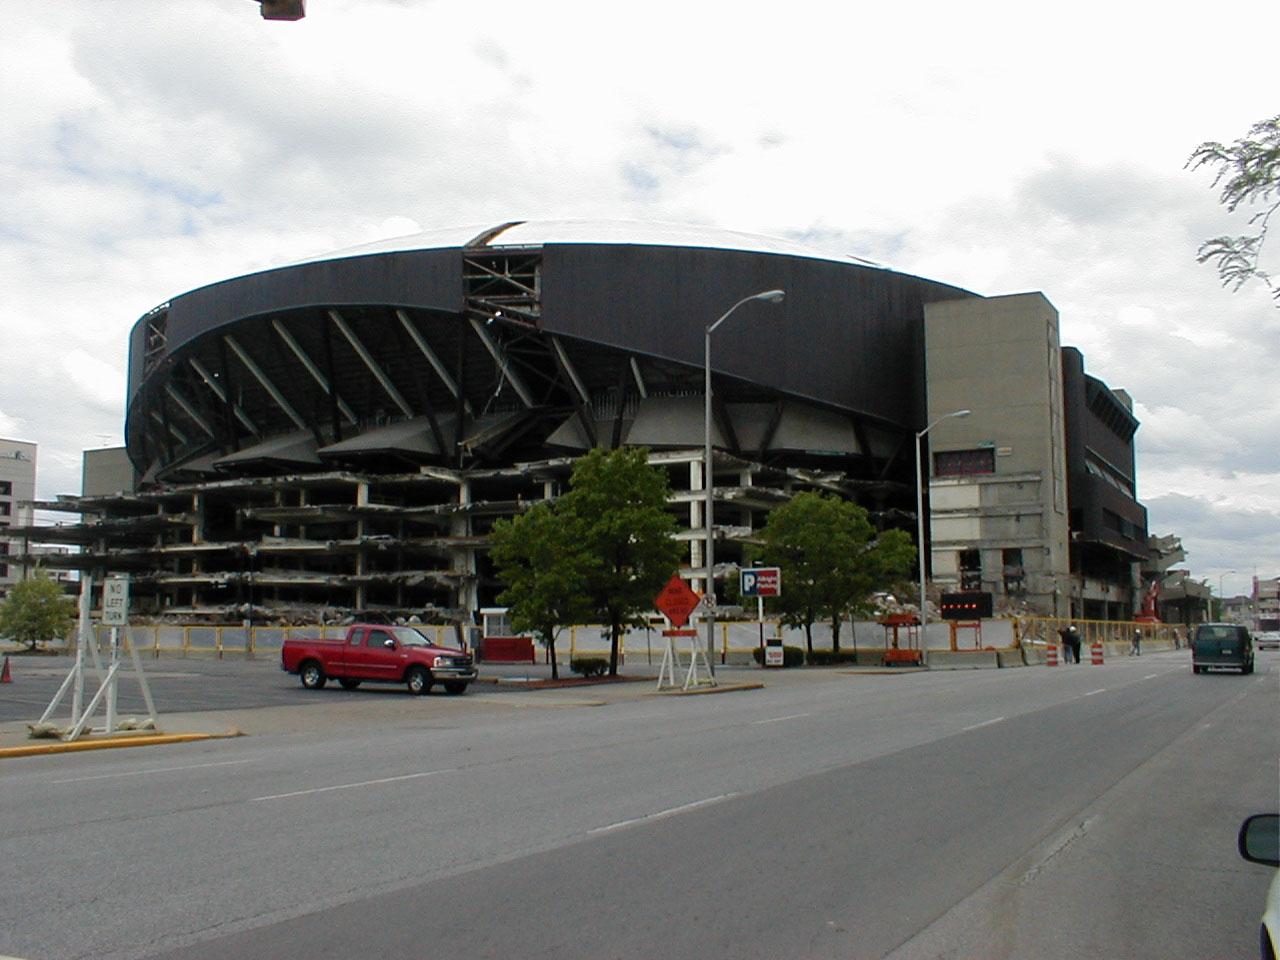 Market Square Arena